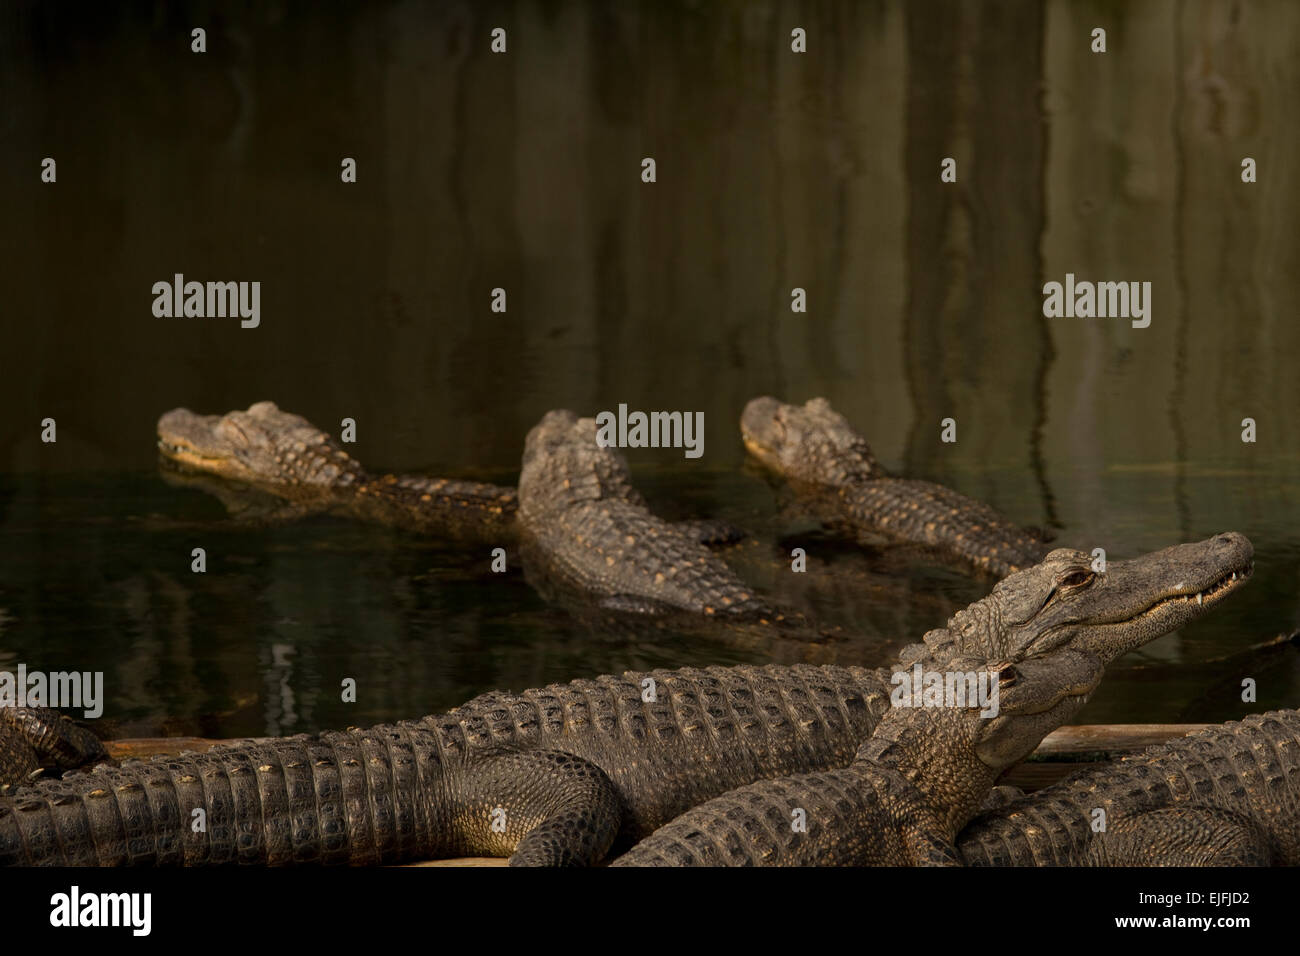 Several American Alligators at Florida gator farm - Stock Image